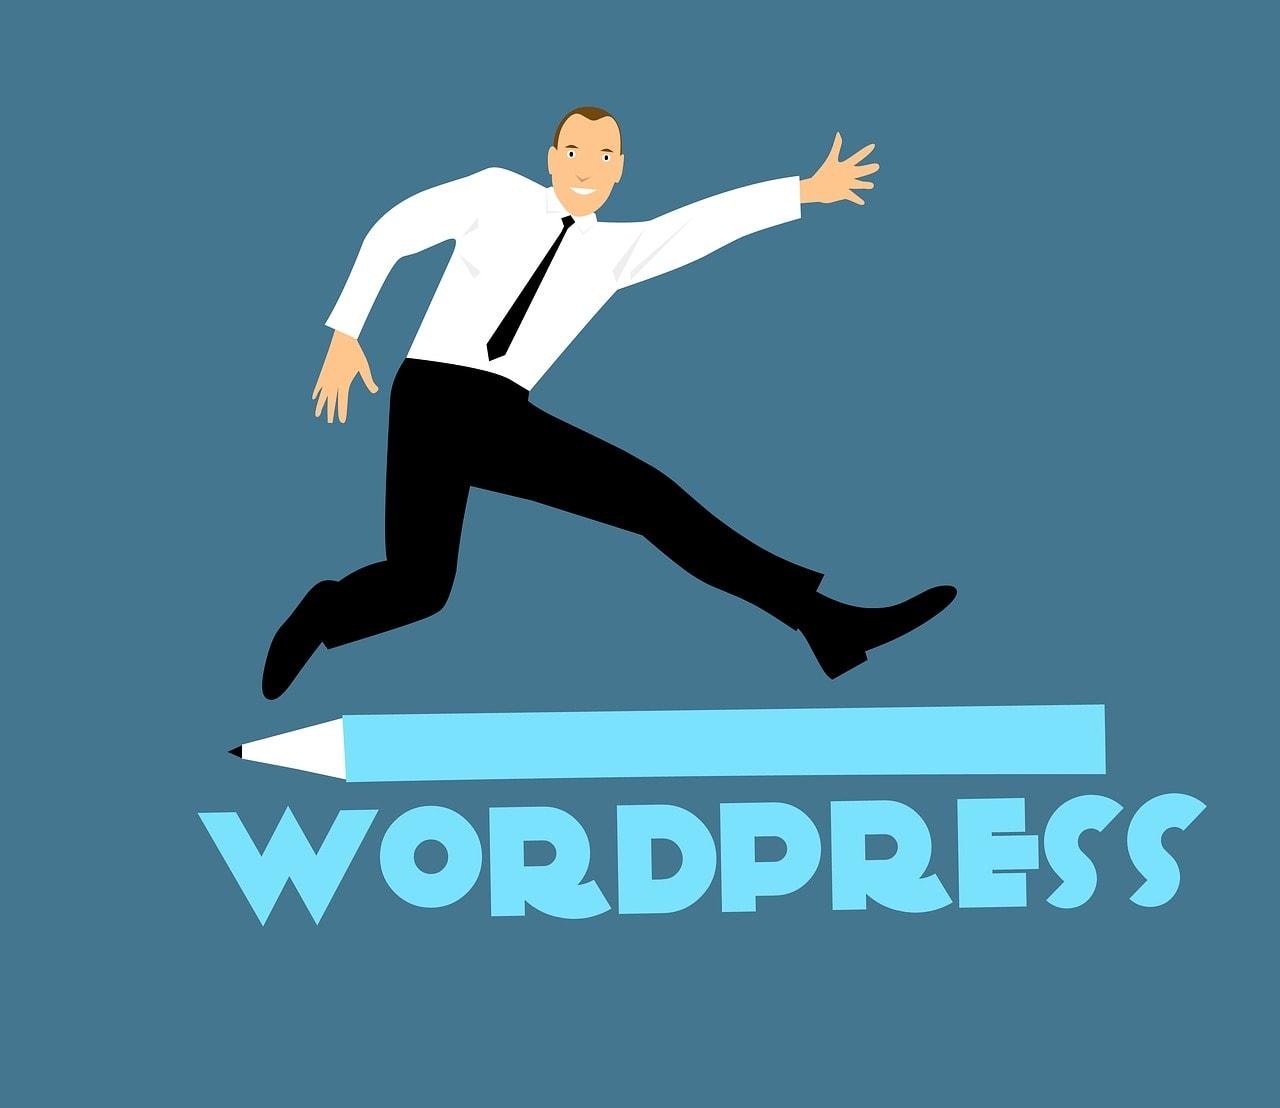 WordPress характеристики и преимущества: Факты, цифры и статистика